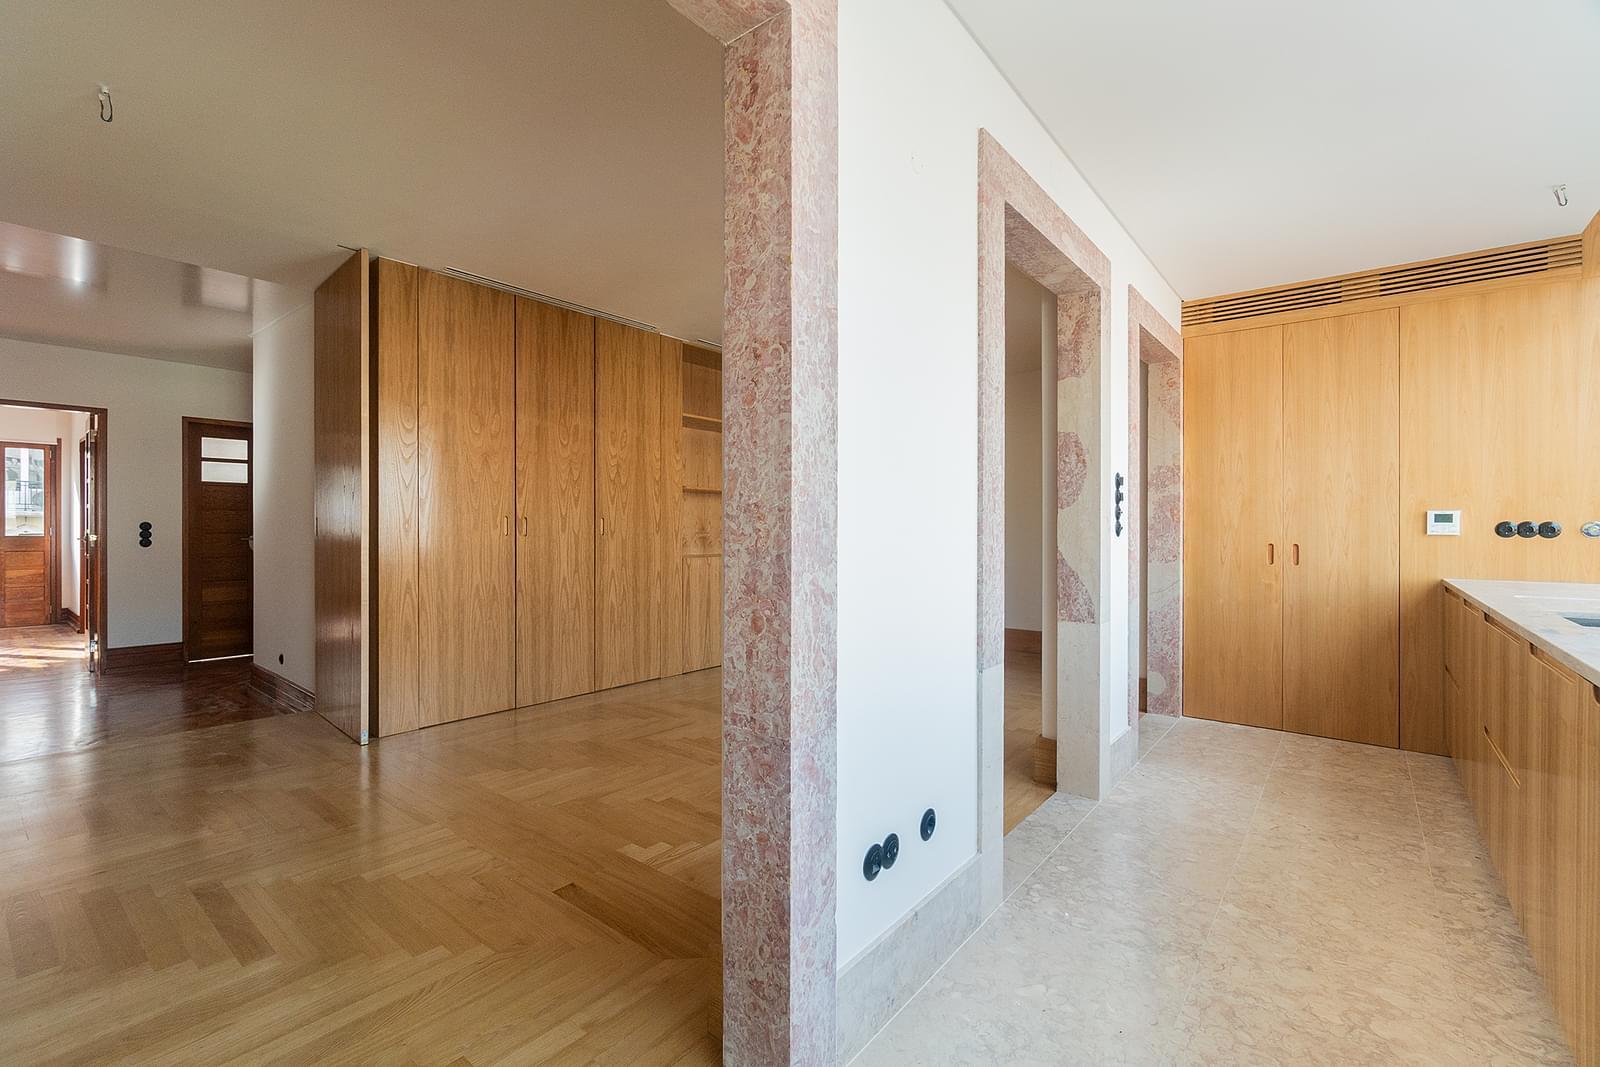 pf18665-apartamento-t3-2-lisboa-3c007f45-c663-4b1a-b656-0dcb72908957